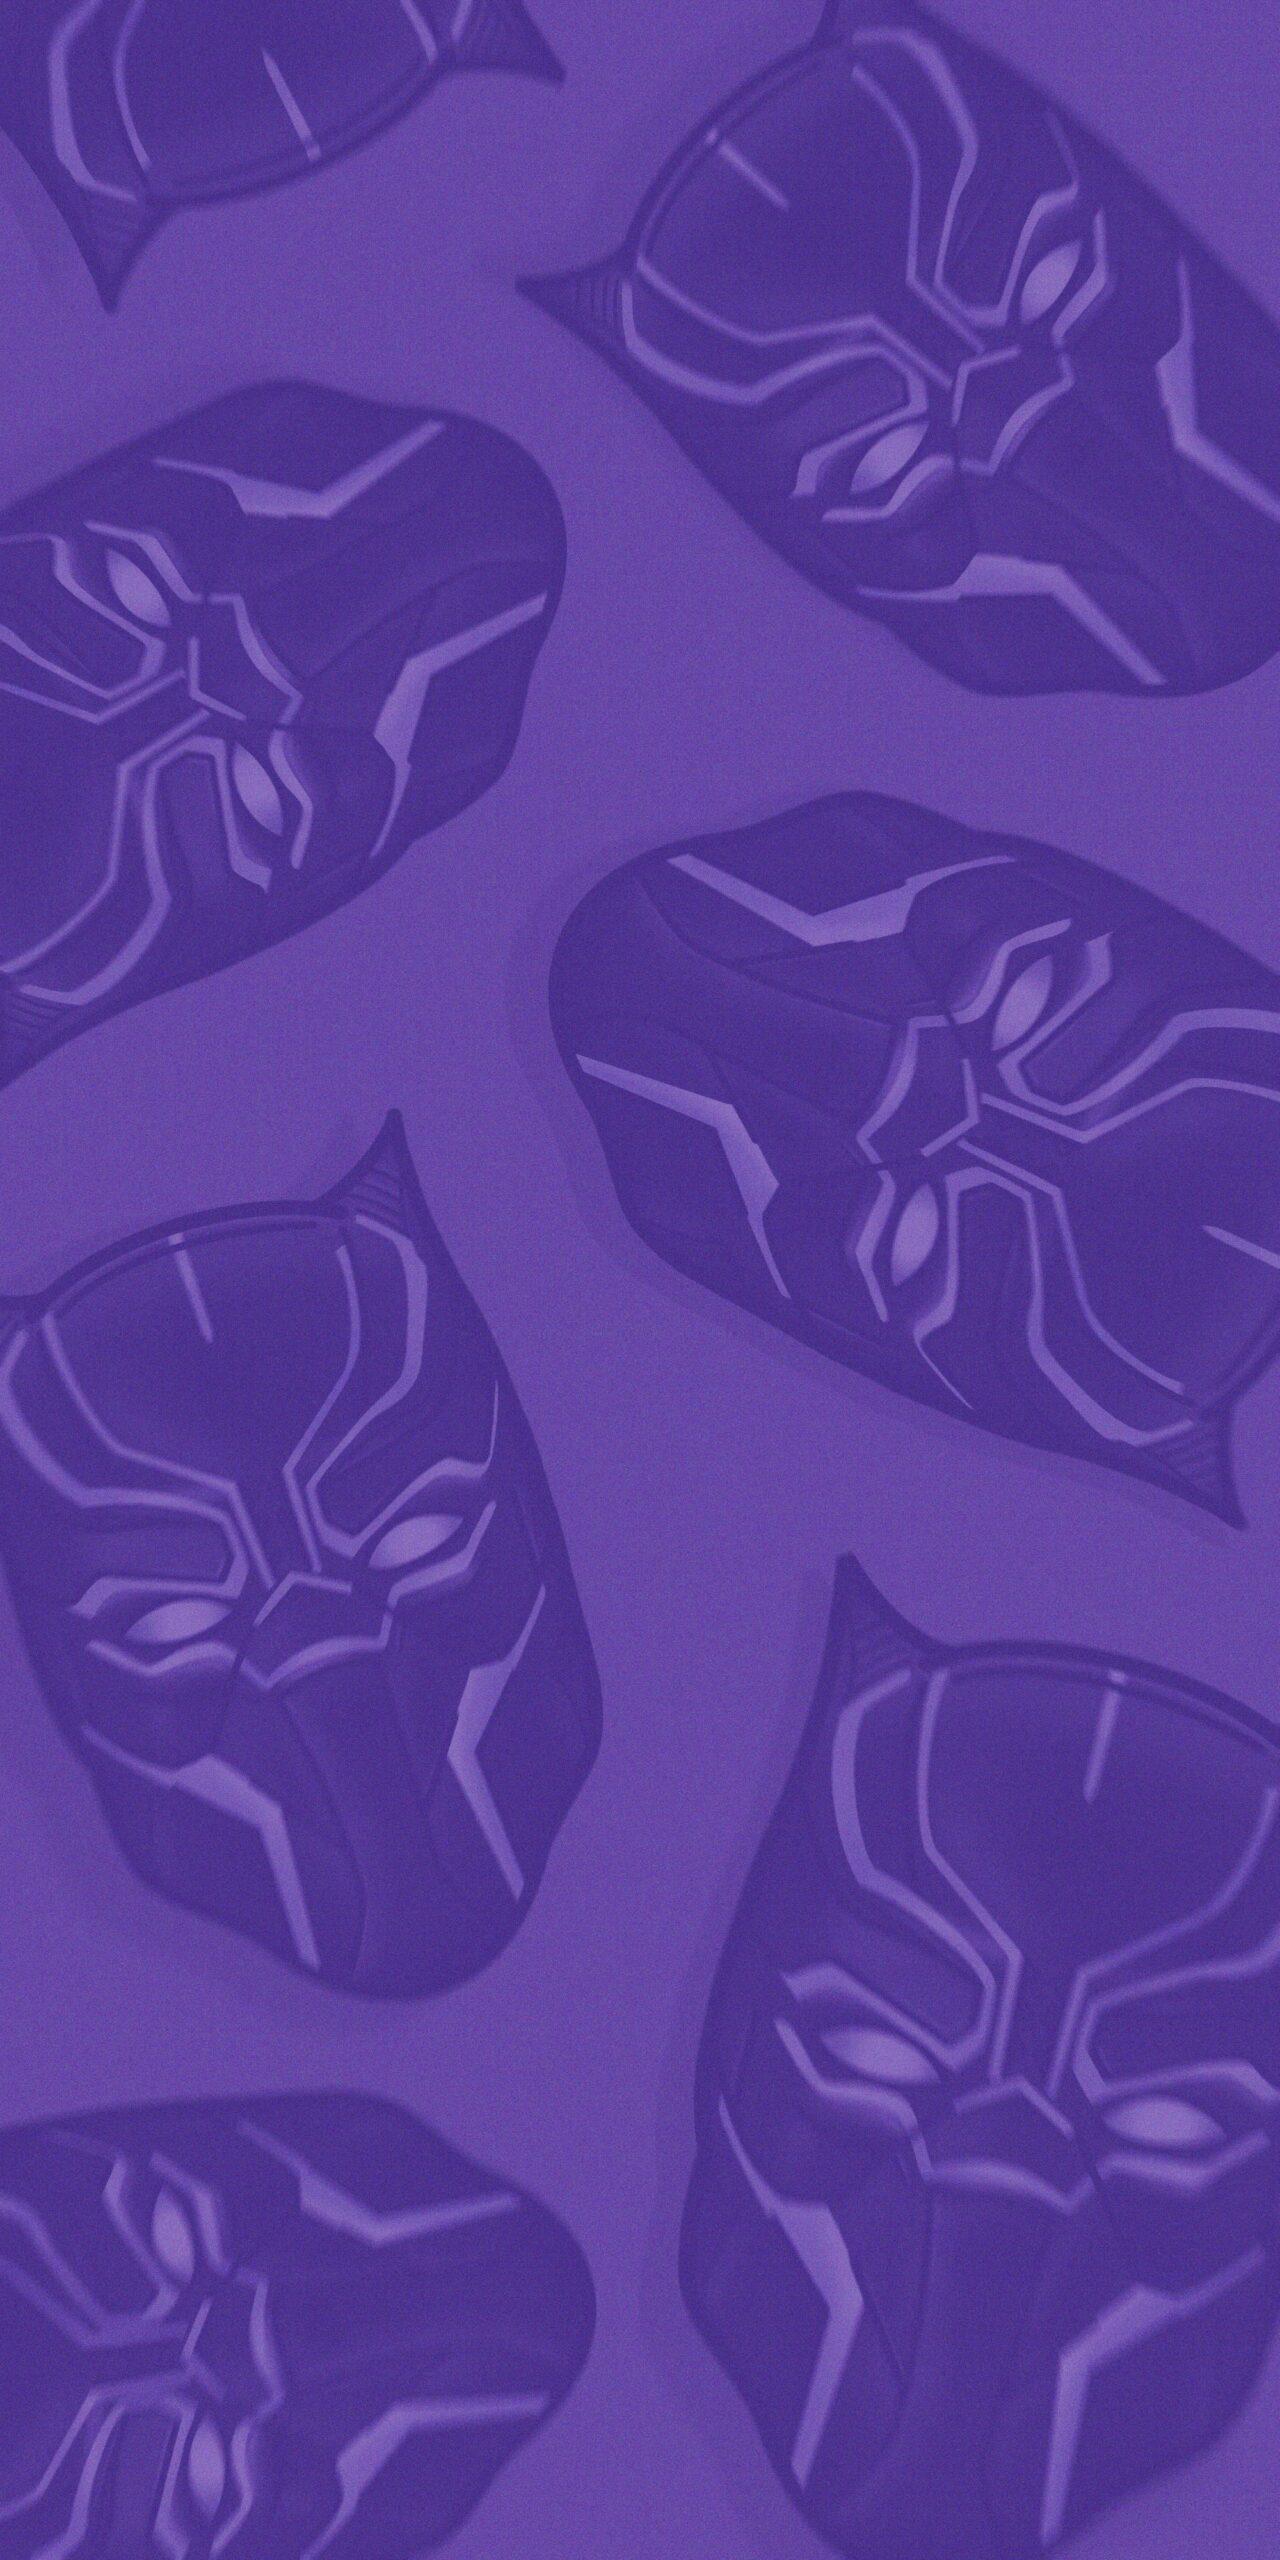 black panther head purple background wallpaper